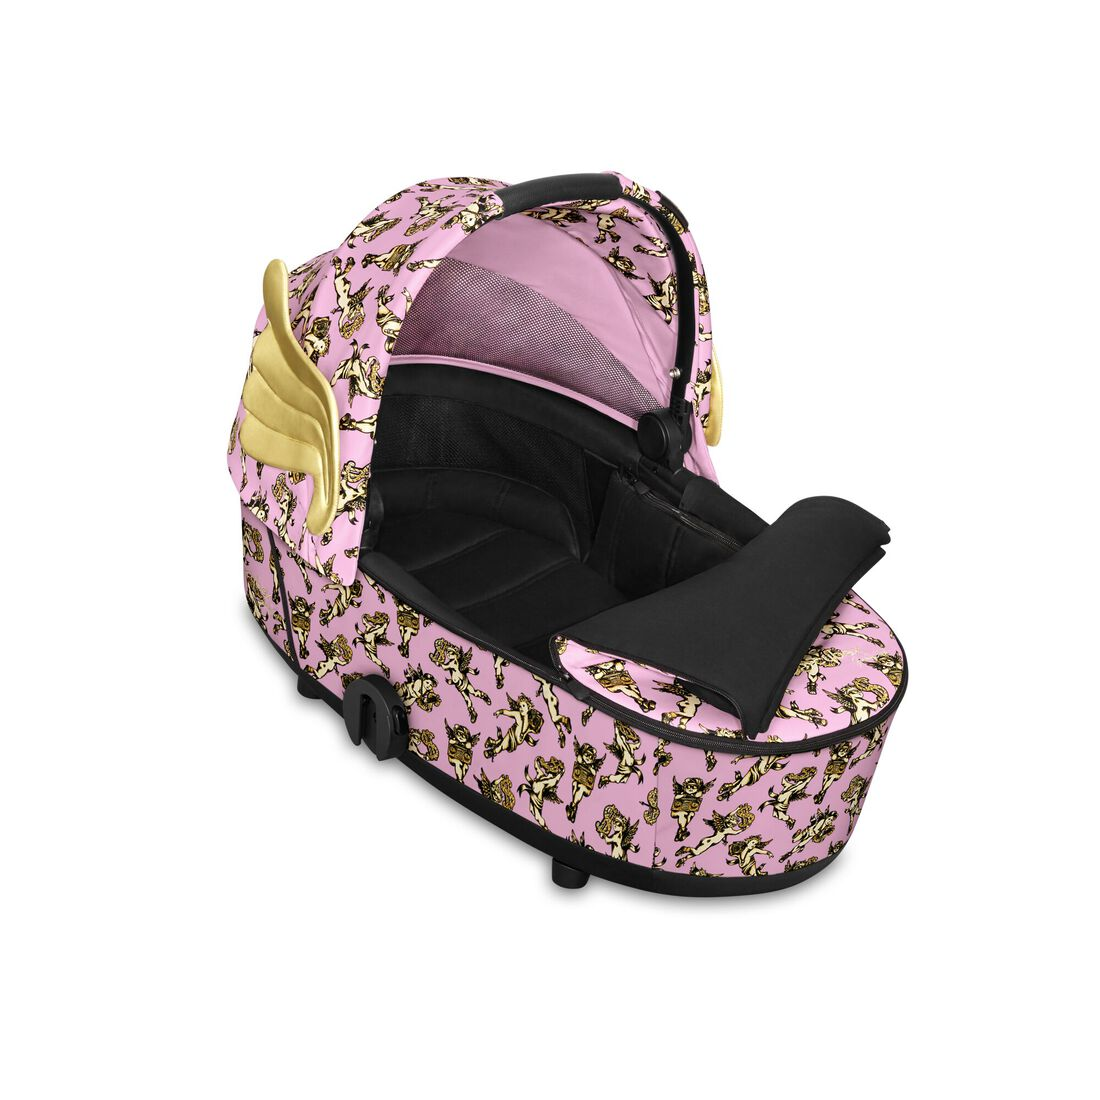 CYBEX Mios Lux Carry Cot - Cherubs Pink in Cherubs Pink large Bild 2